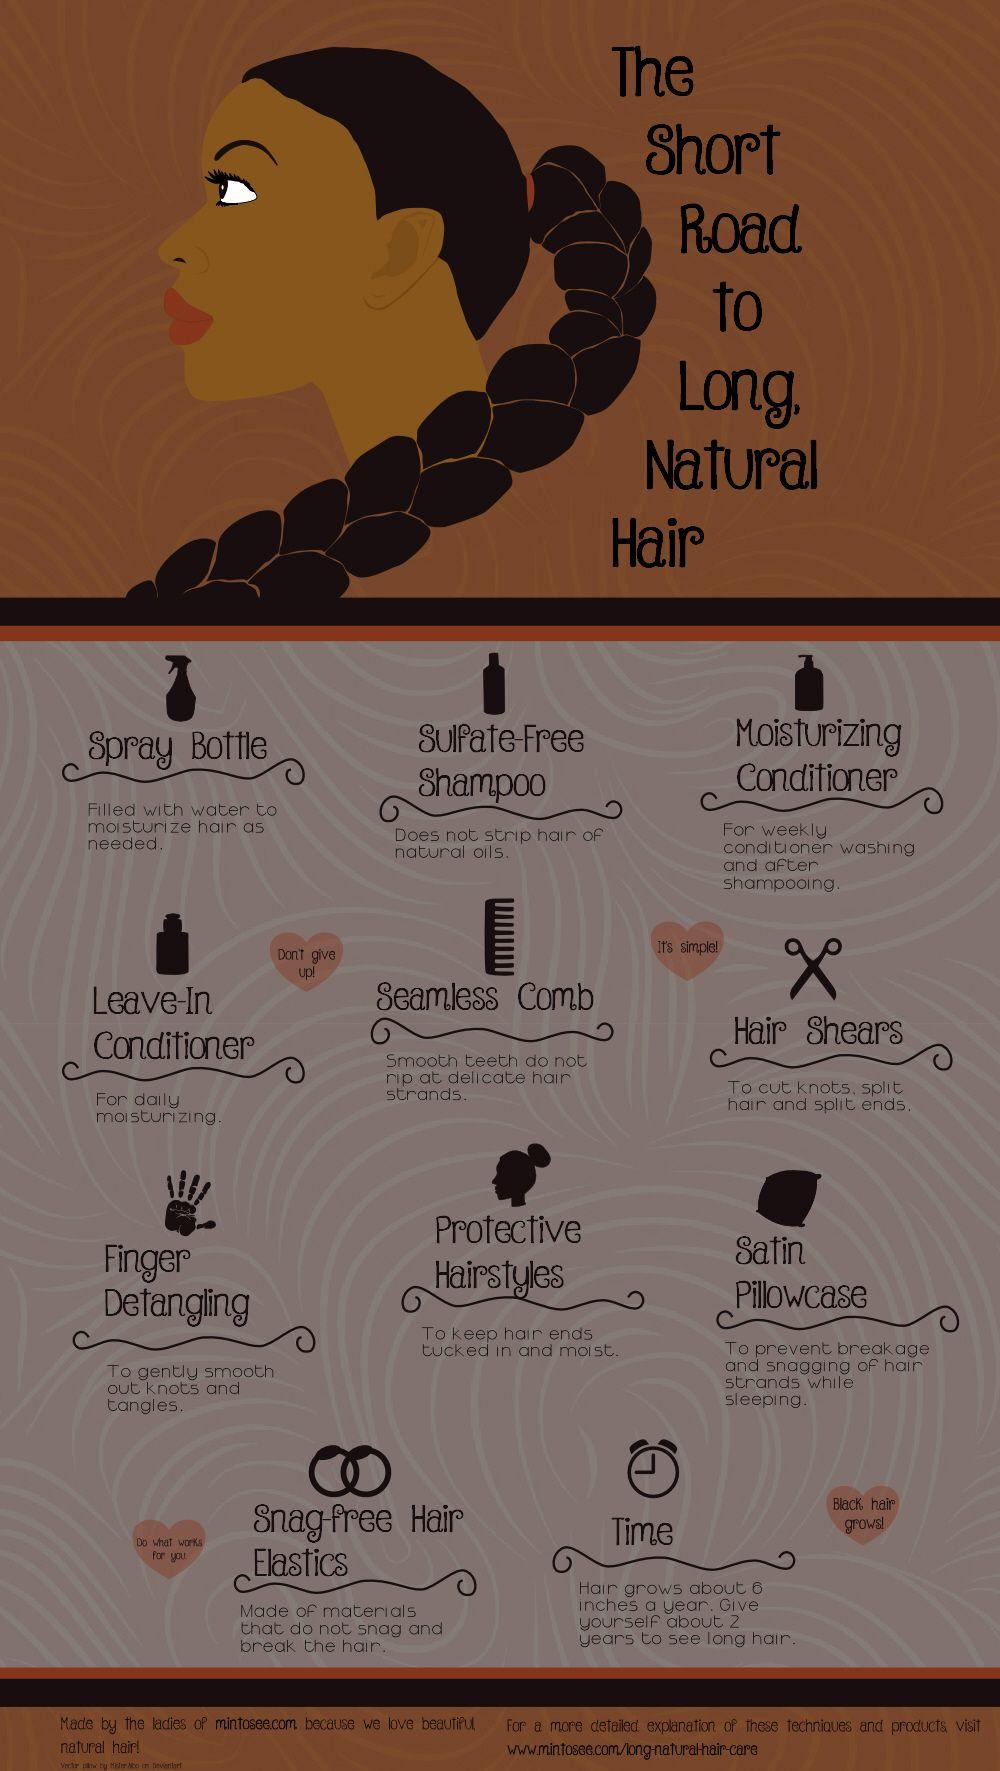 The Short Road to Long Natural Hair www.addisonrenee.com …